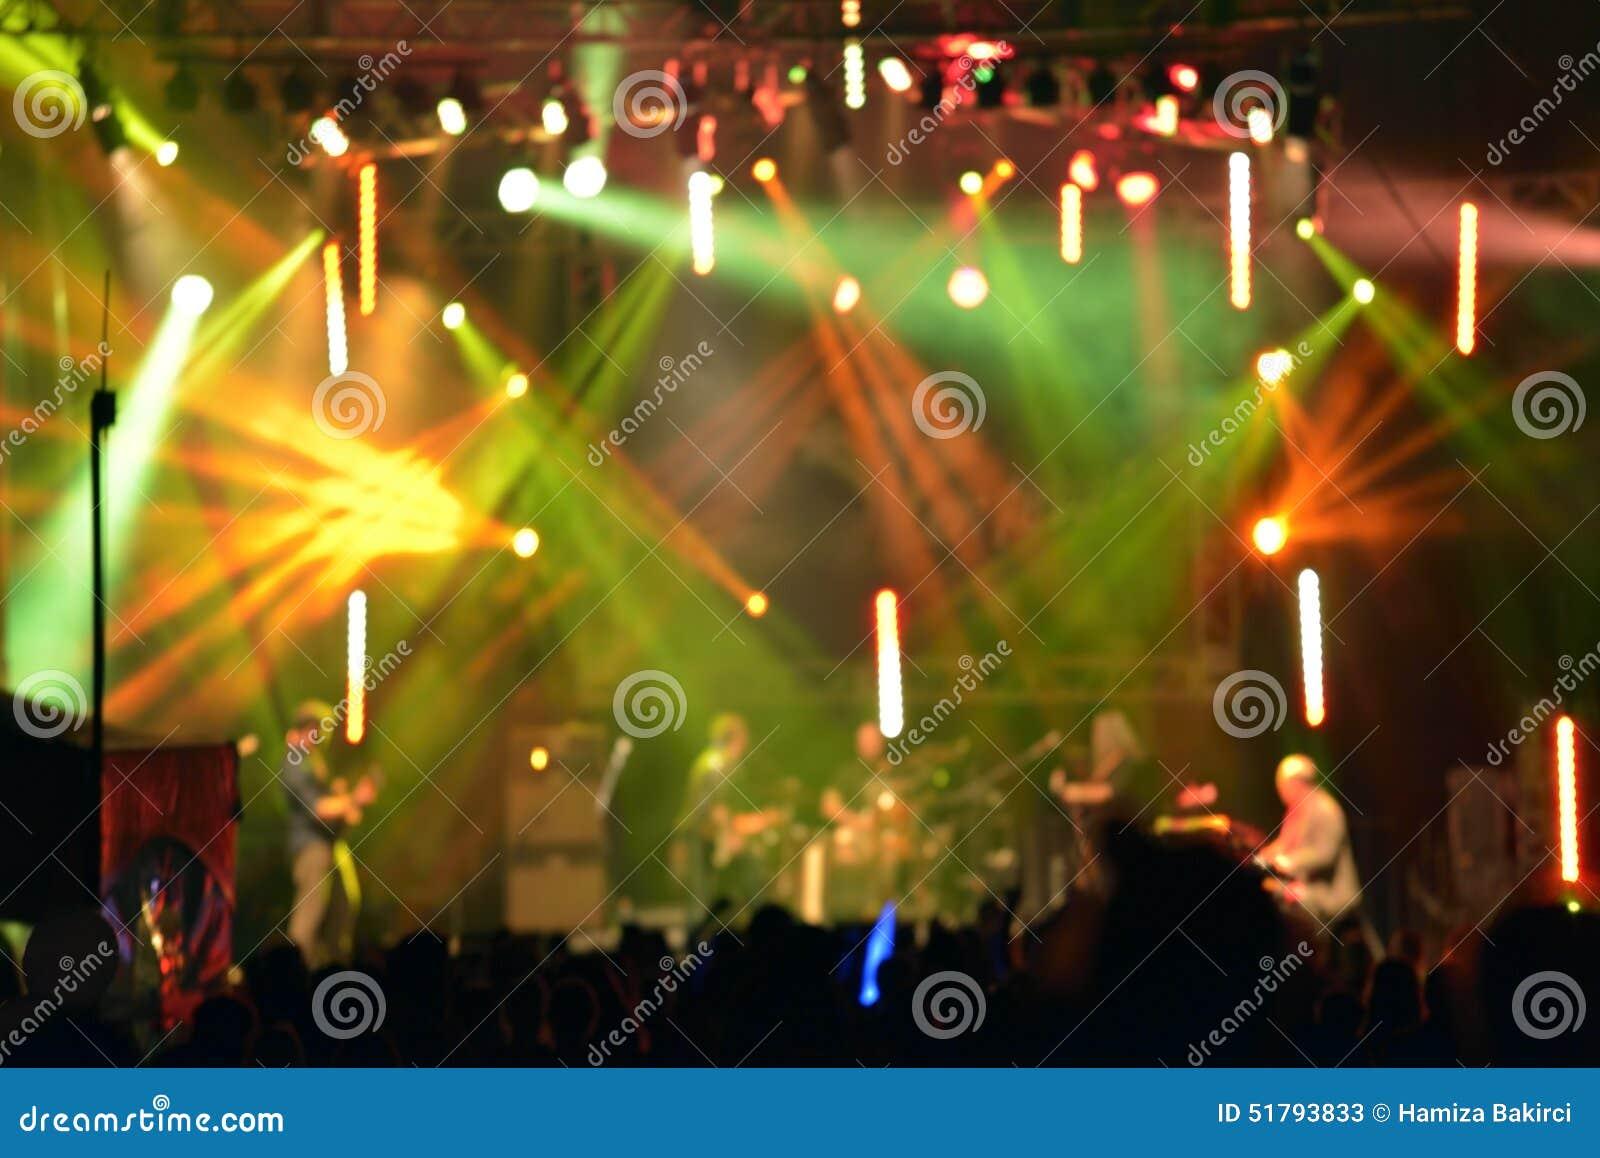 Pics photos rock concert background - Background Concert Light Rock